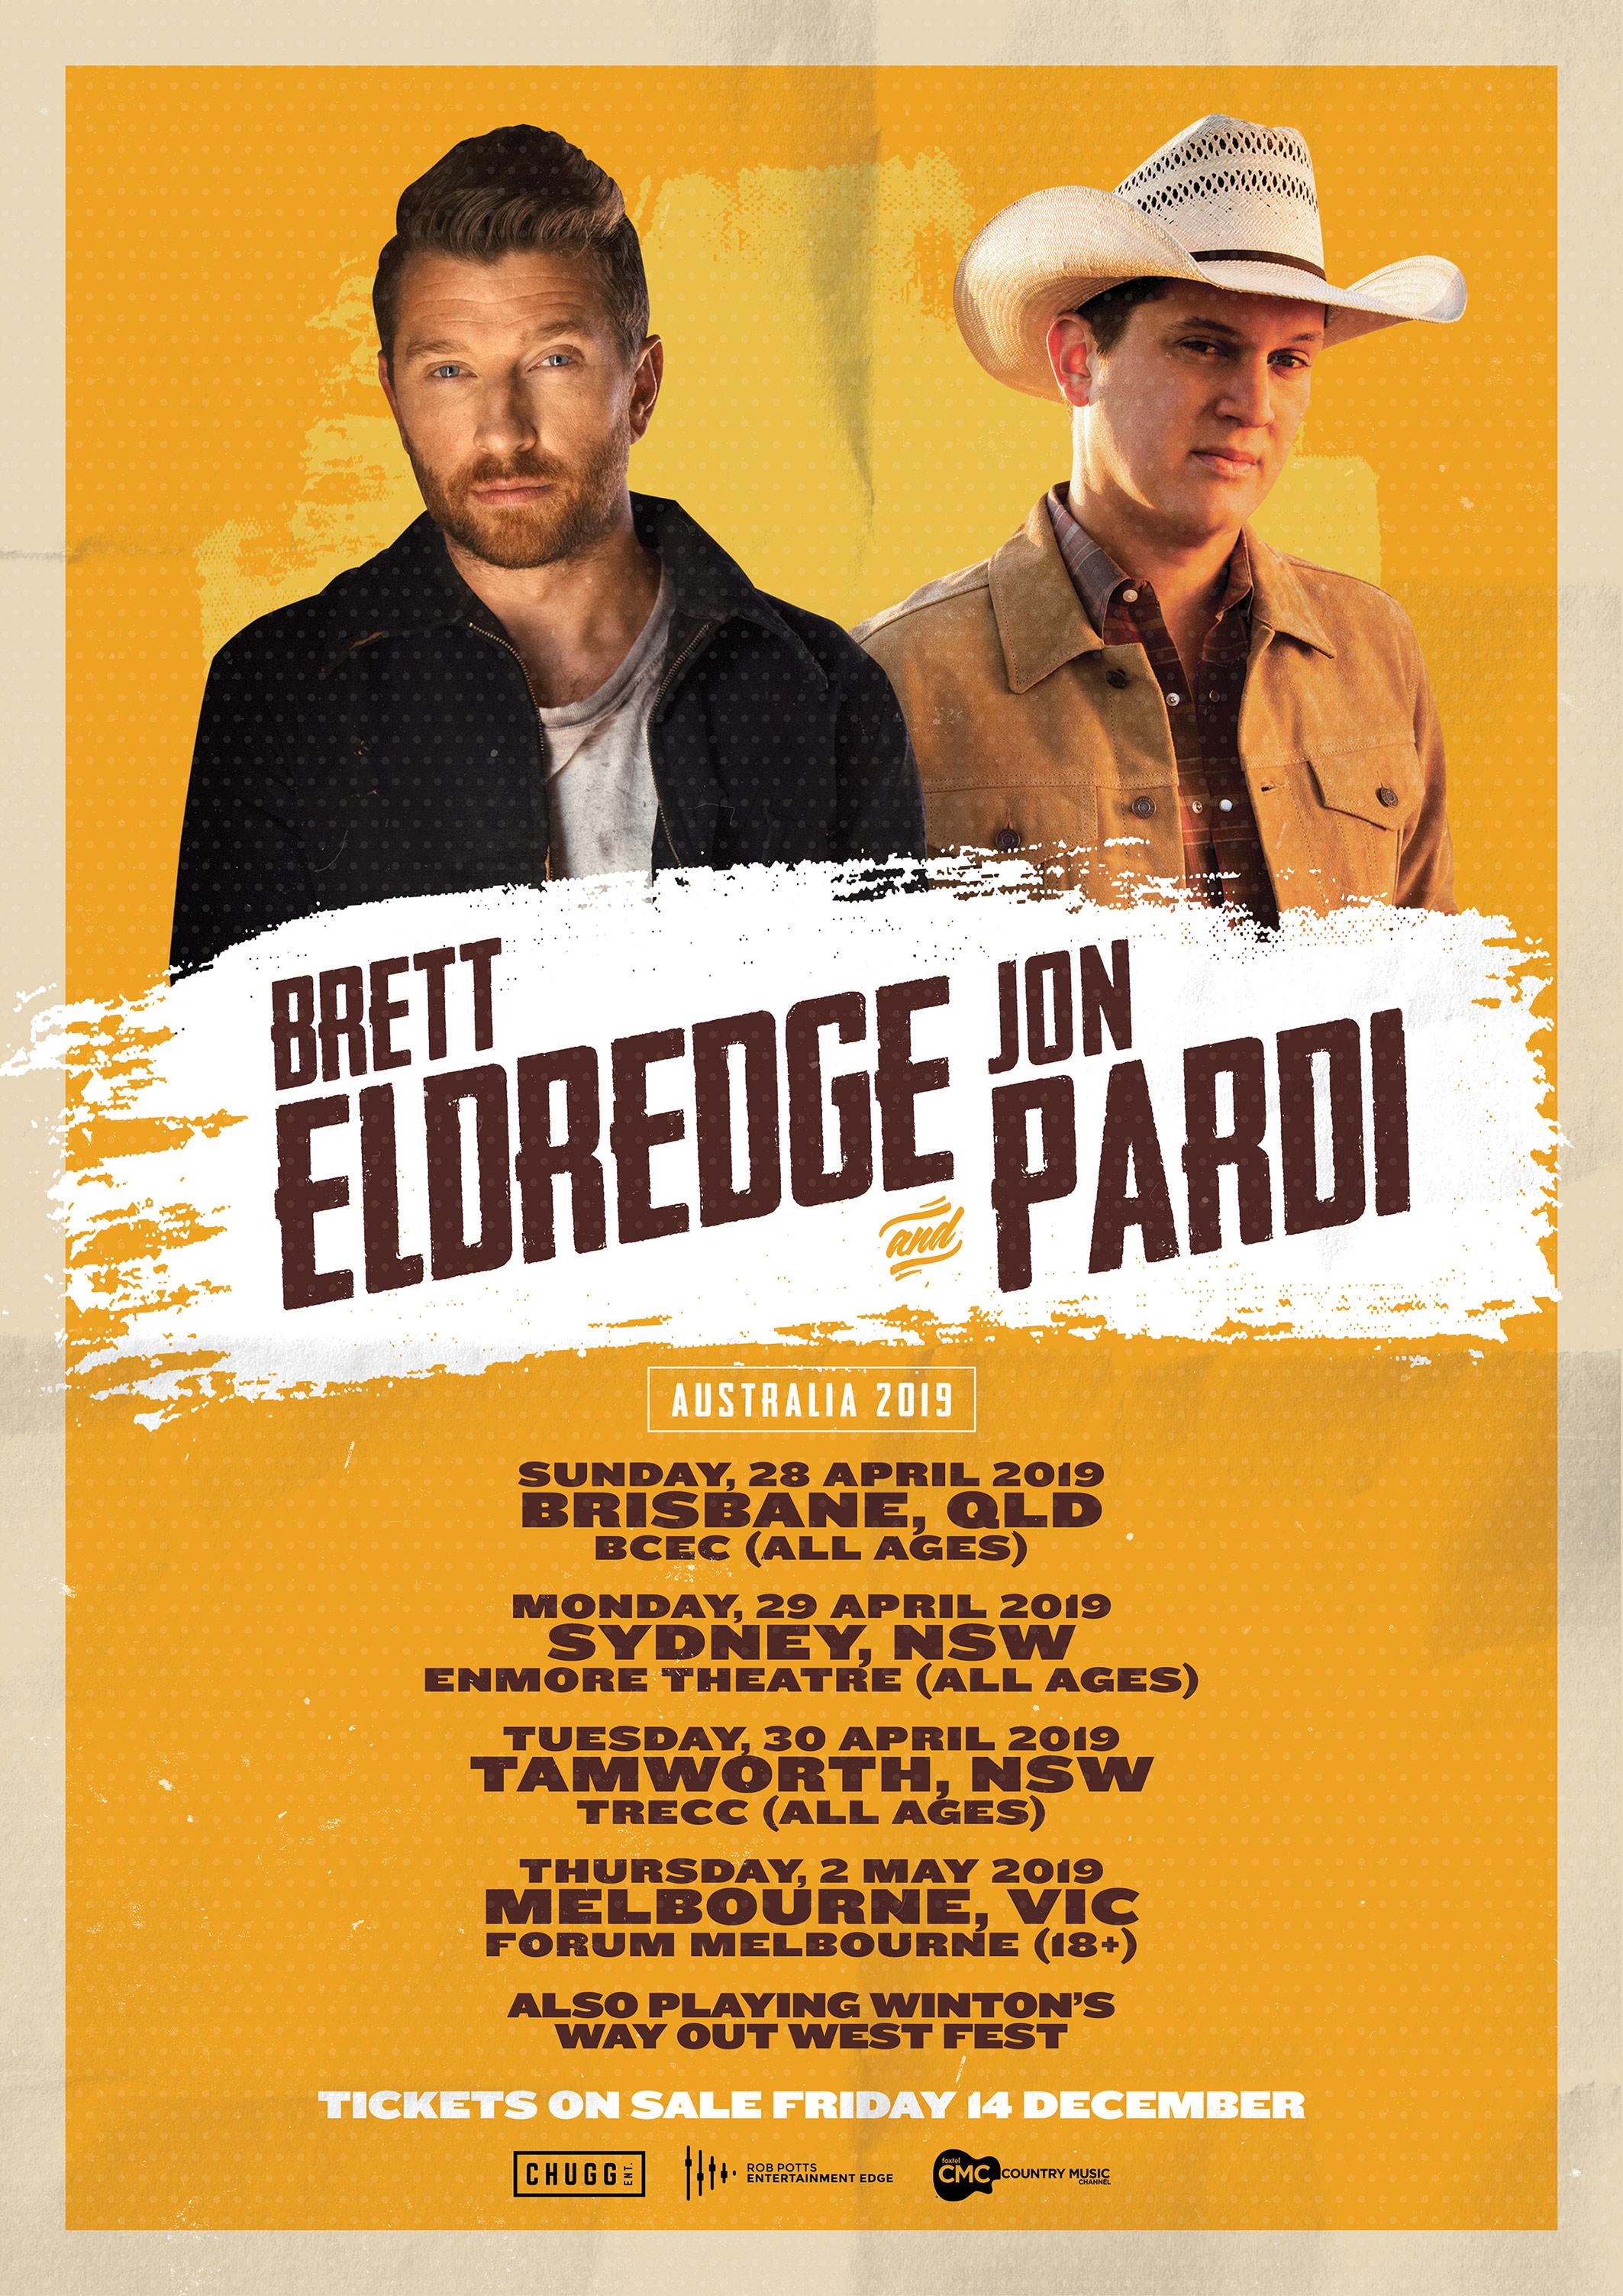 Brett Eldredge & Jon Pardi